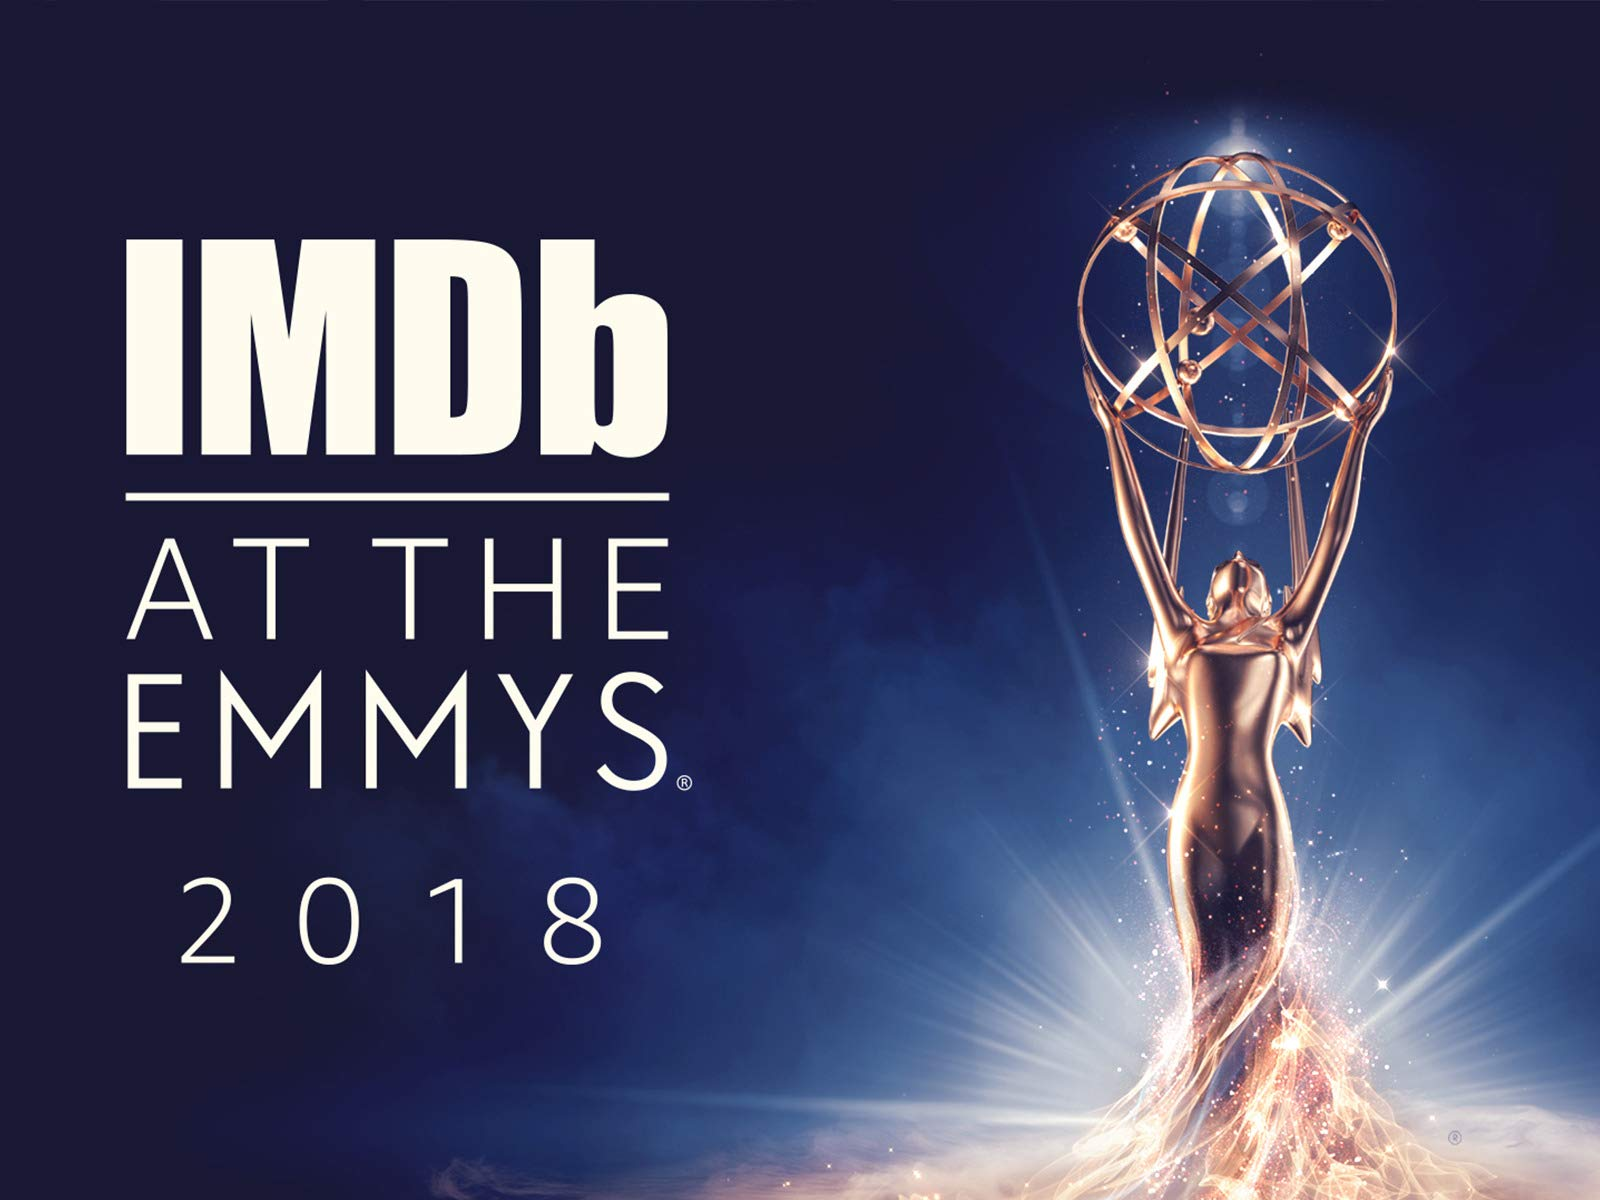 IMDb at the Emmys 2018 - Season 1